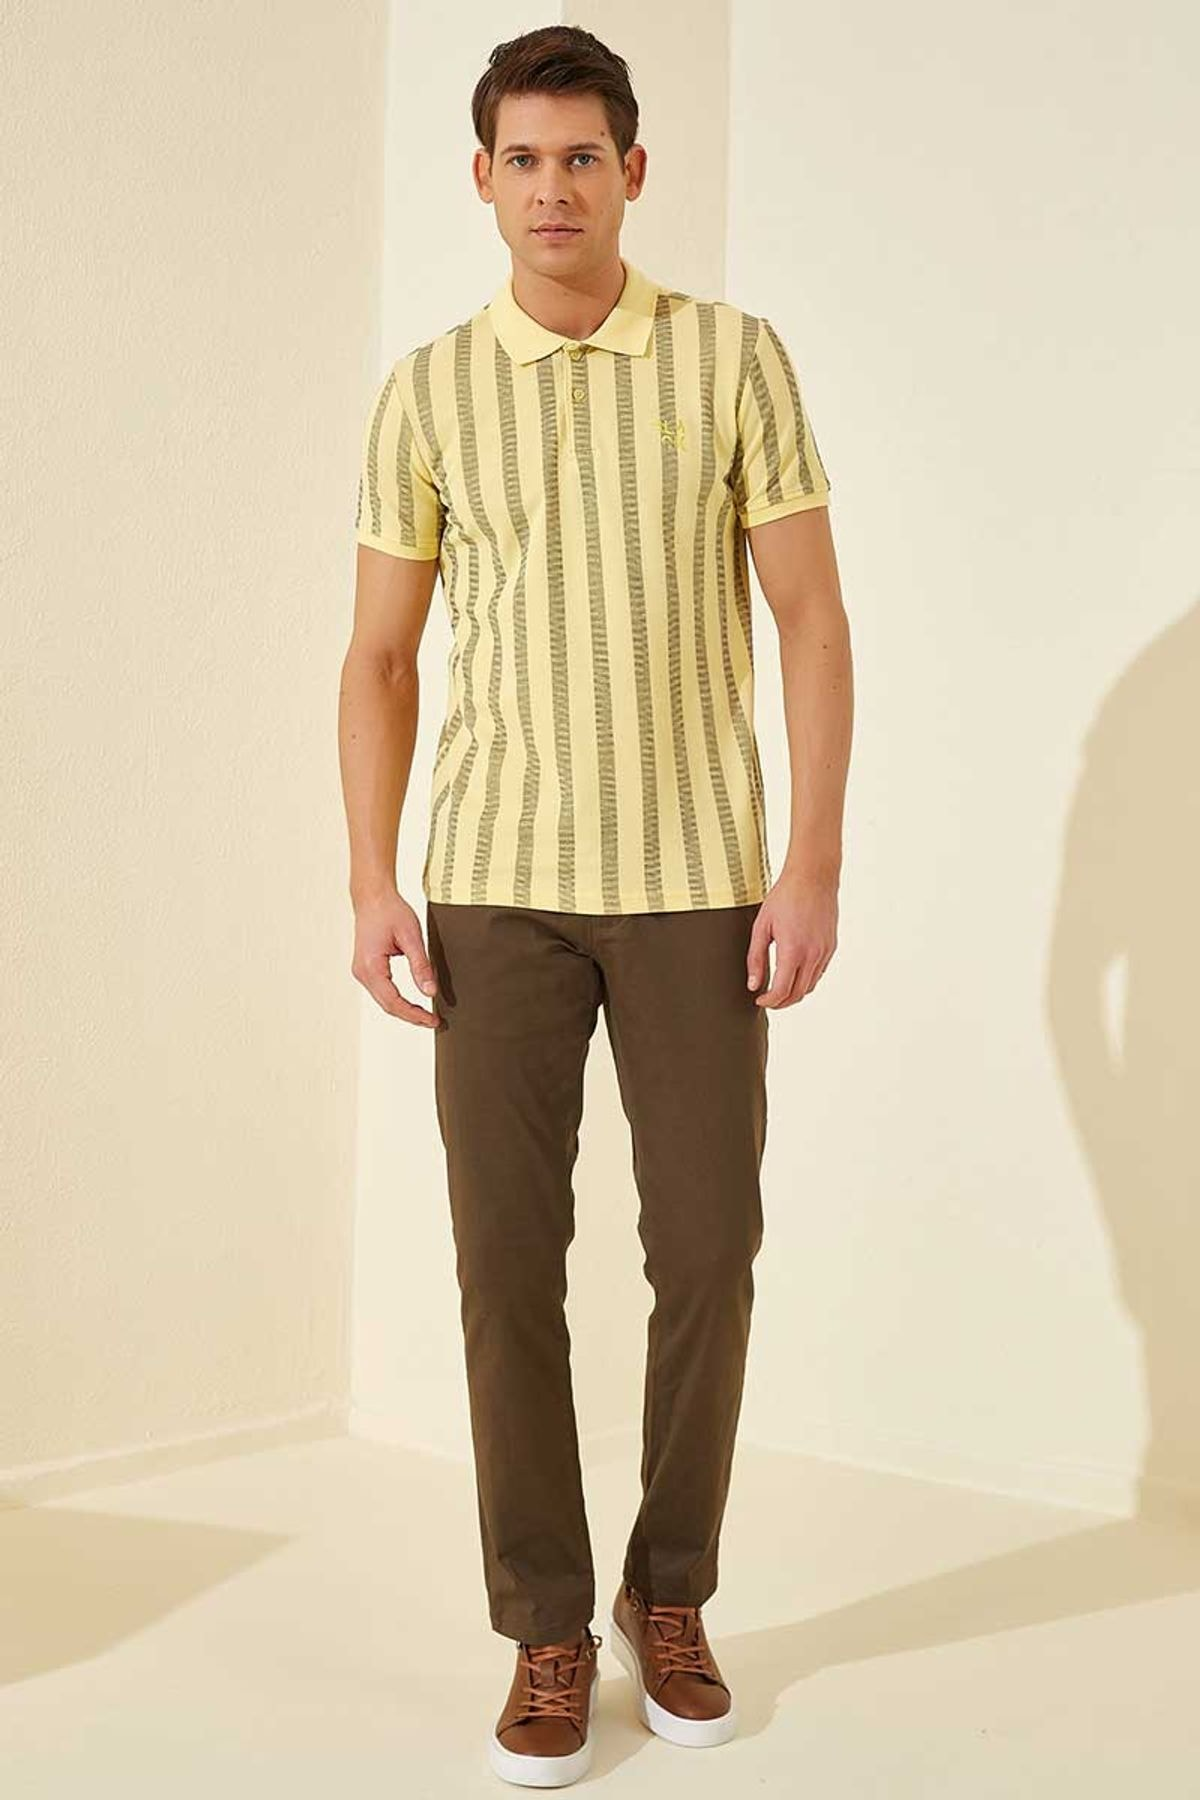 Tommy Life Desenli Polo Yaka Sarı Erkek Tshirt T08ER-87805_1 1